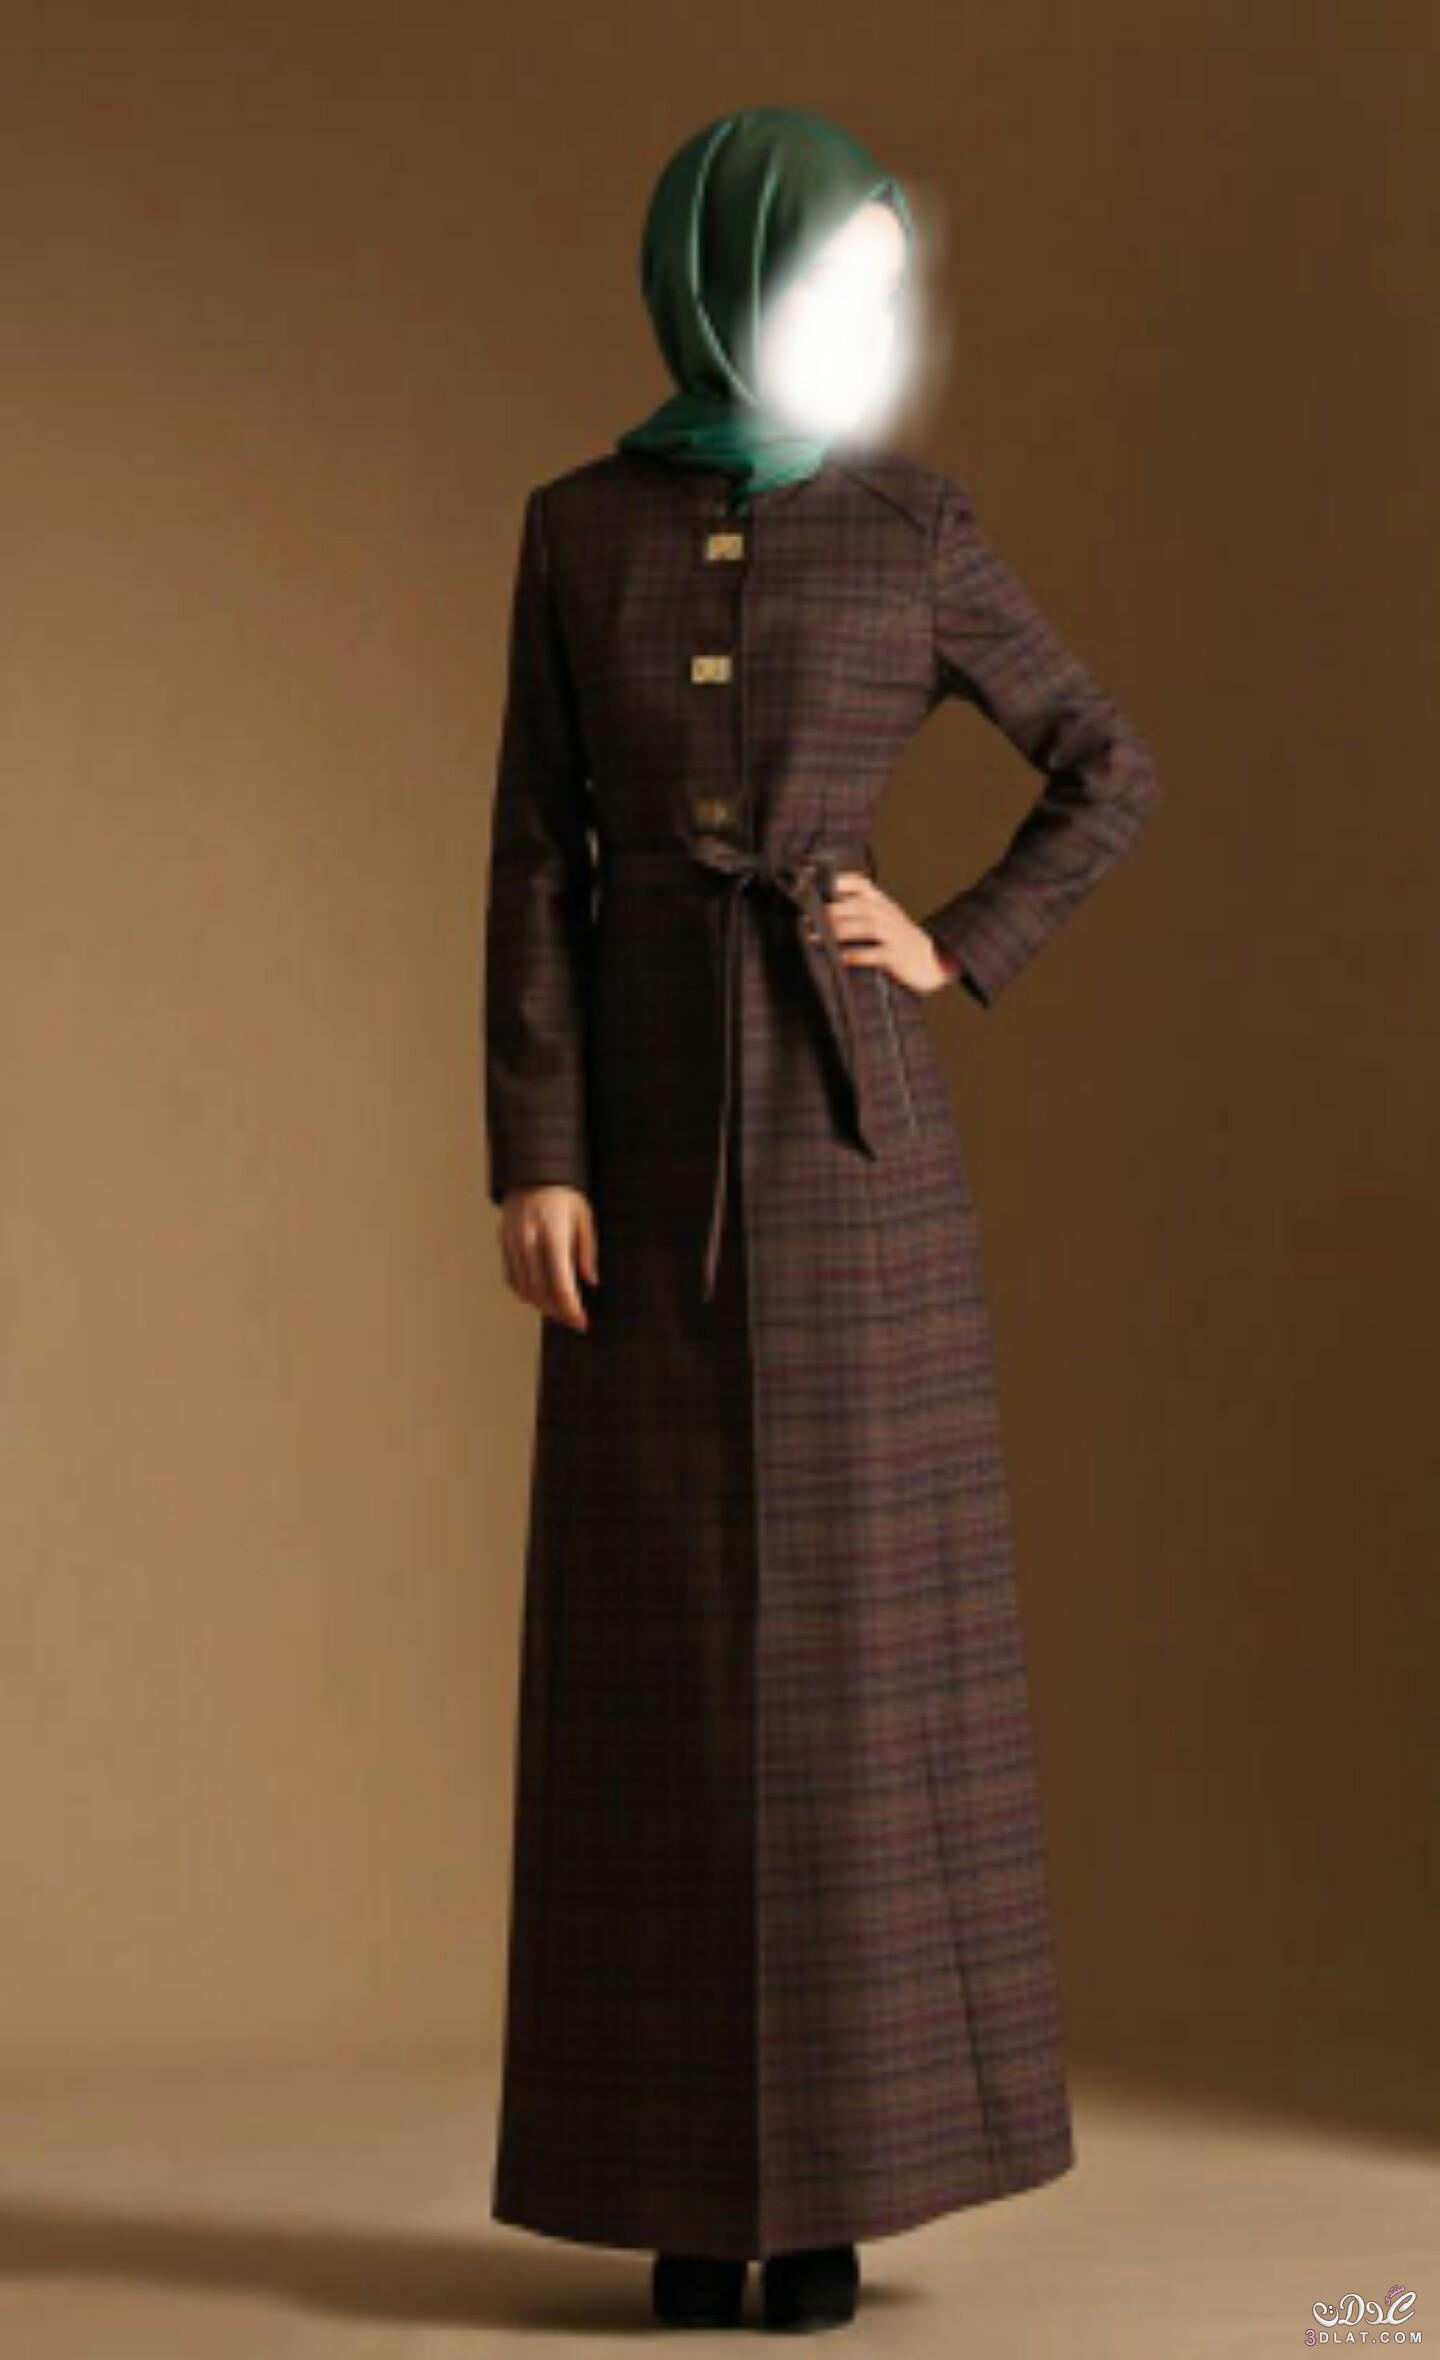 8bcc58ffd ملابس محجبات تركية 2020 ؛ تألقي بملابس محجبات راقية - لازورد